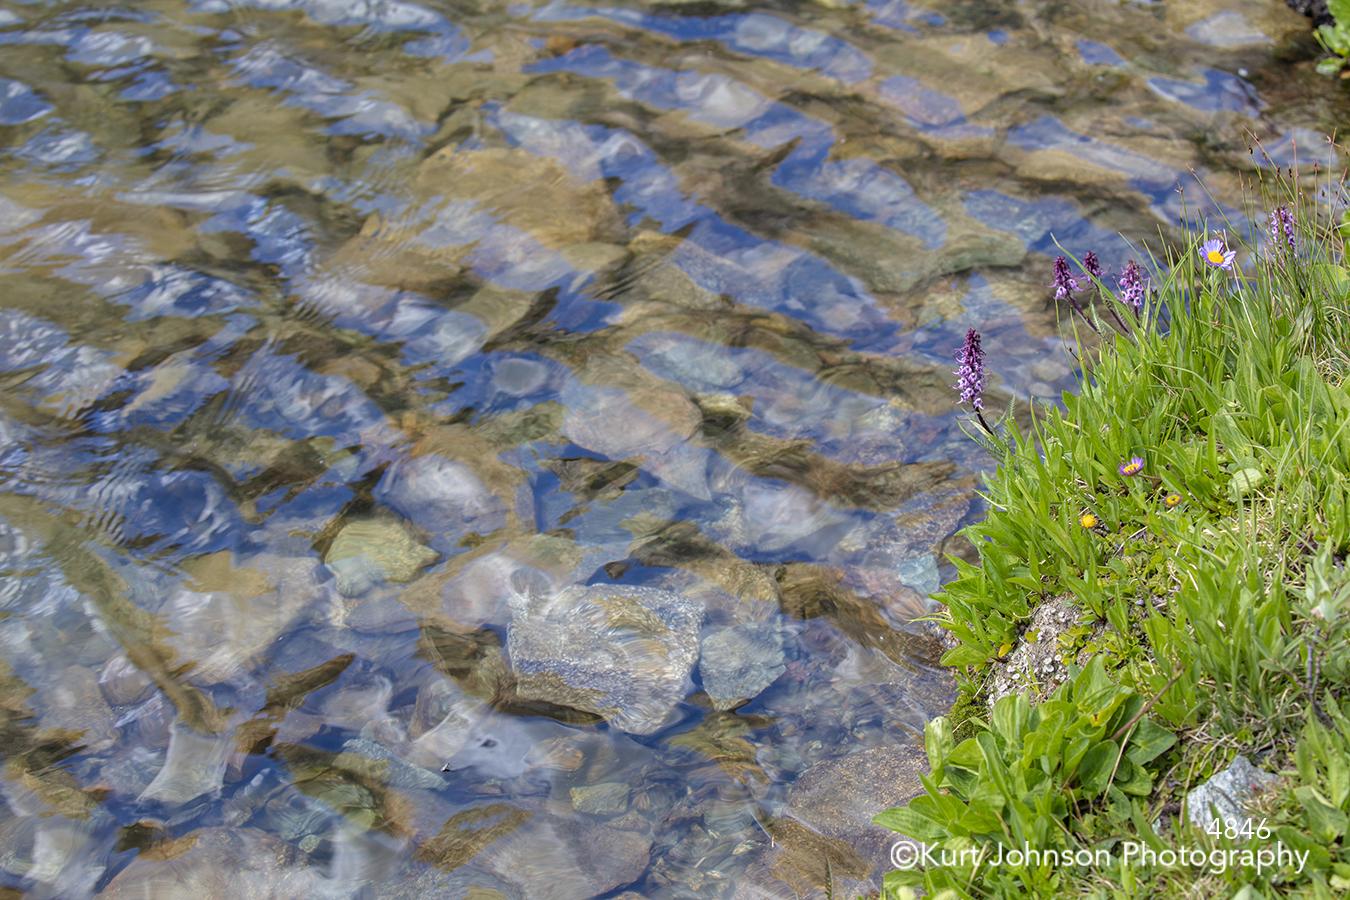 still calm water blue waves rocks stones green grass grasses waterscape edge